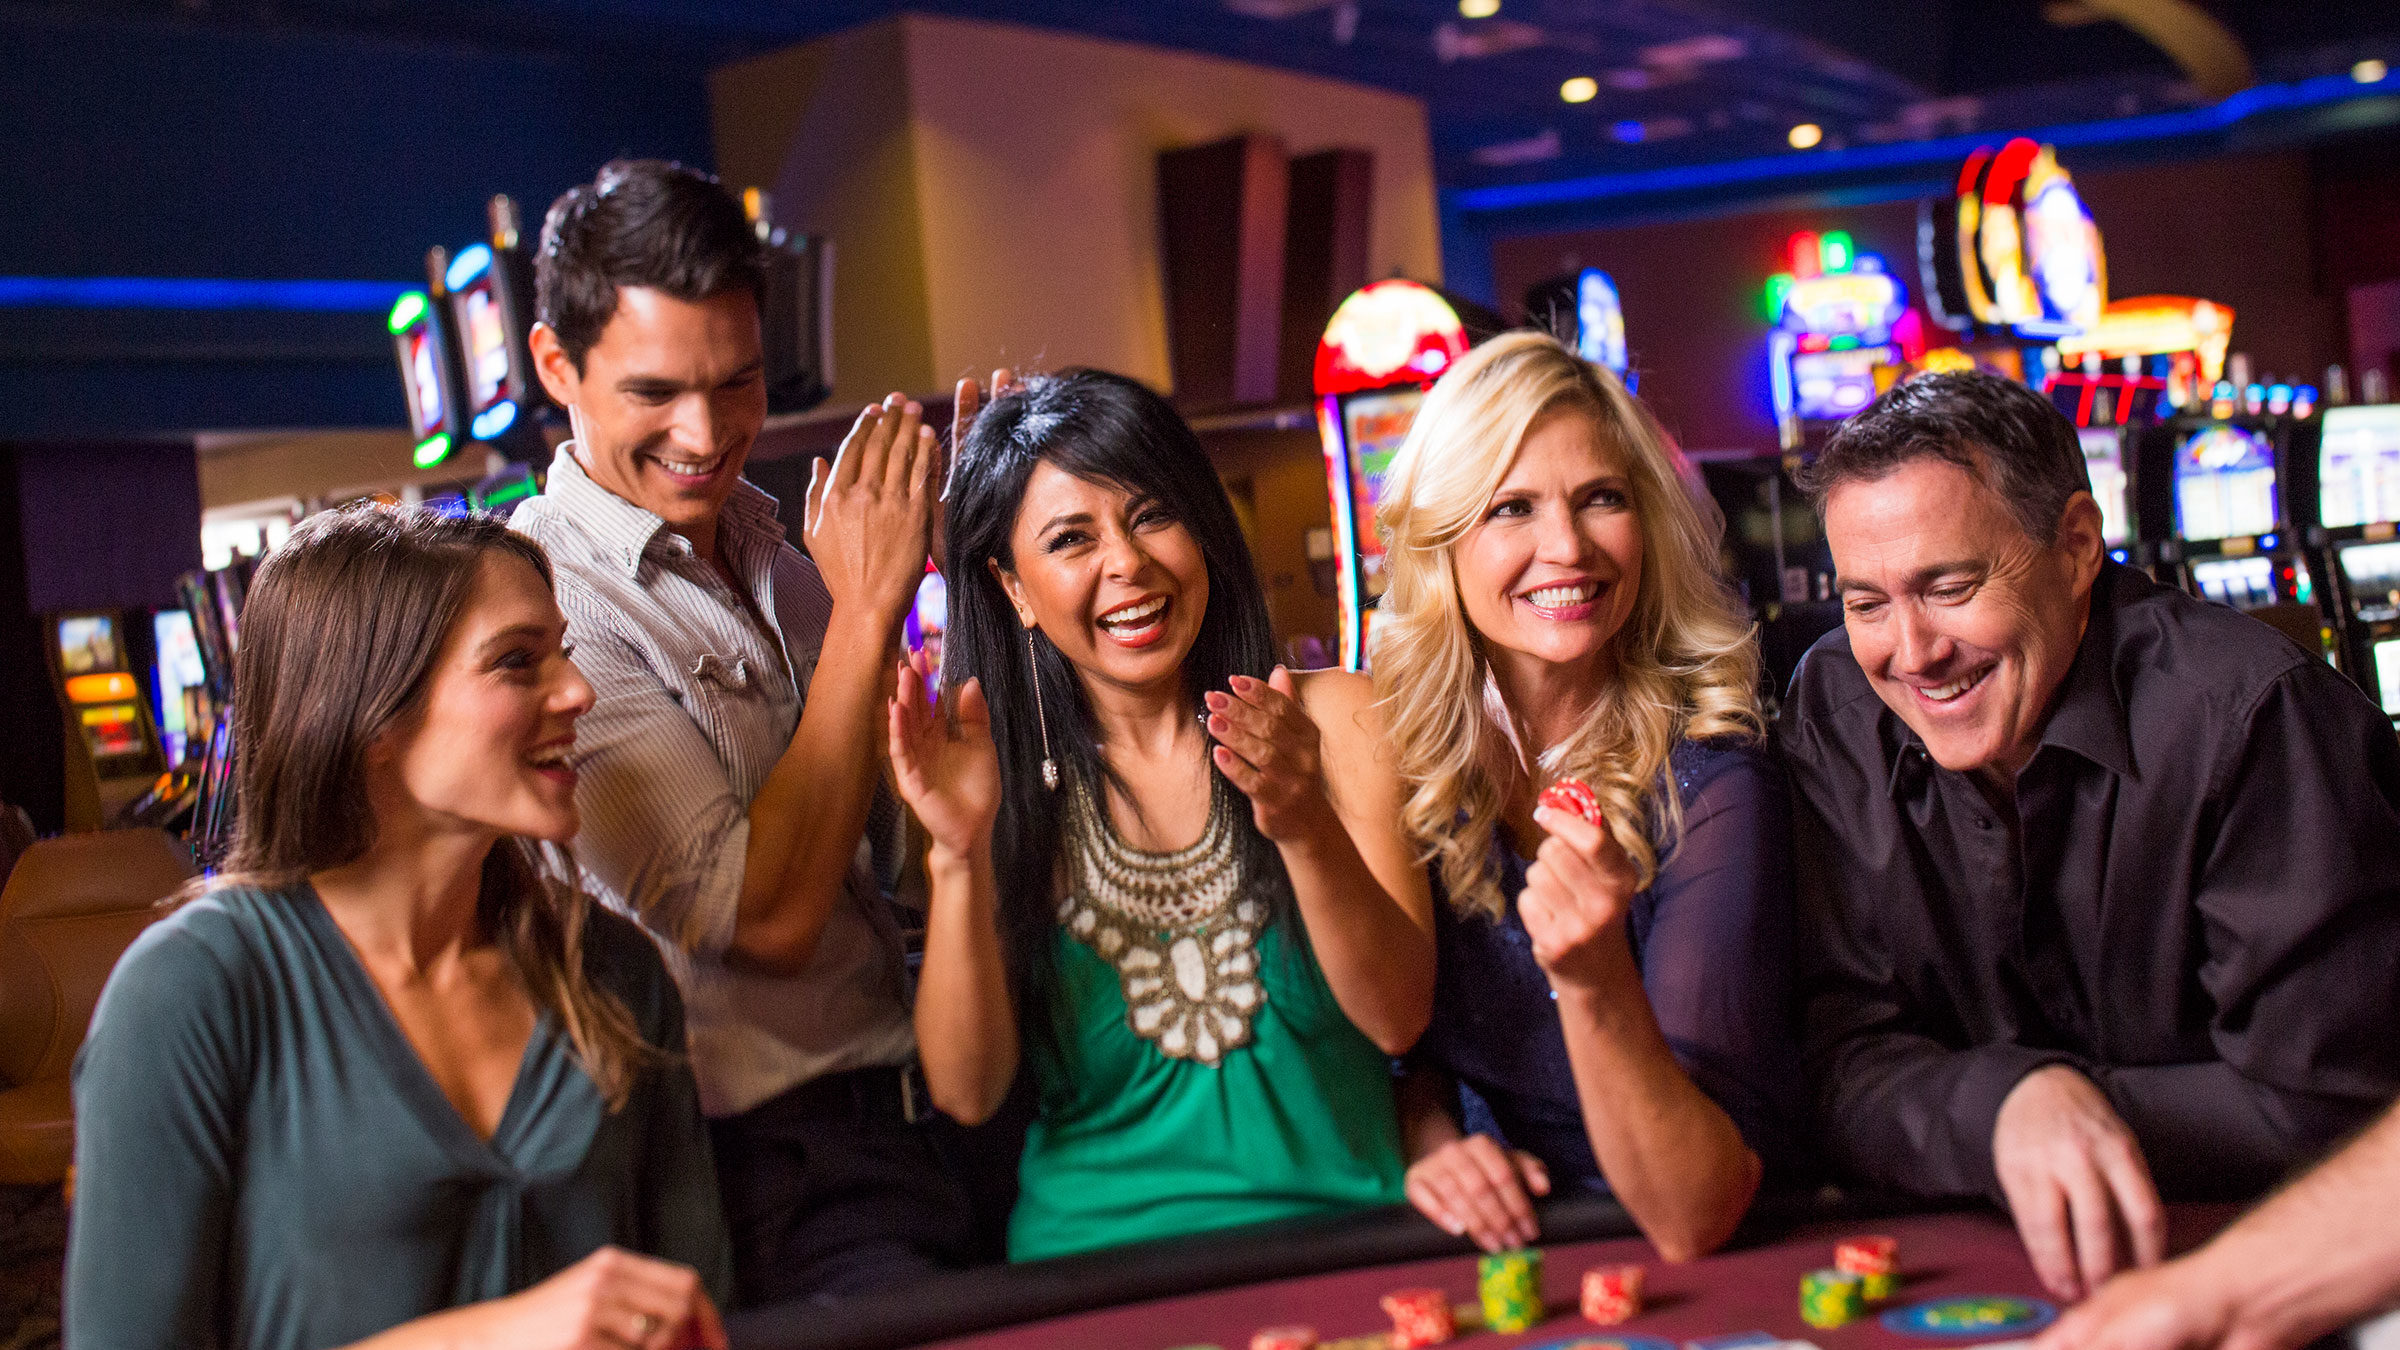 New Mexico's #1 Casino: Inn of the Mountain Gods Casino